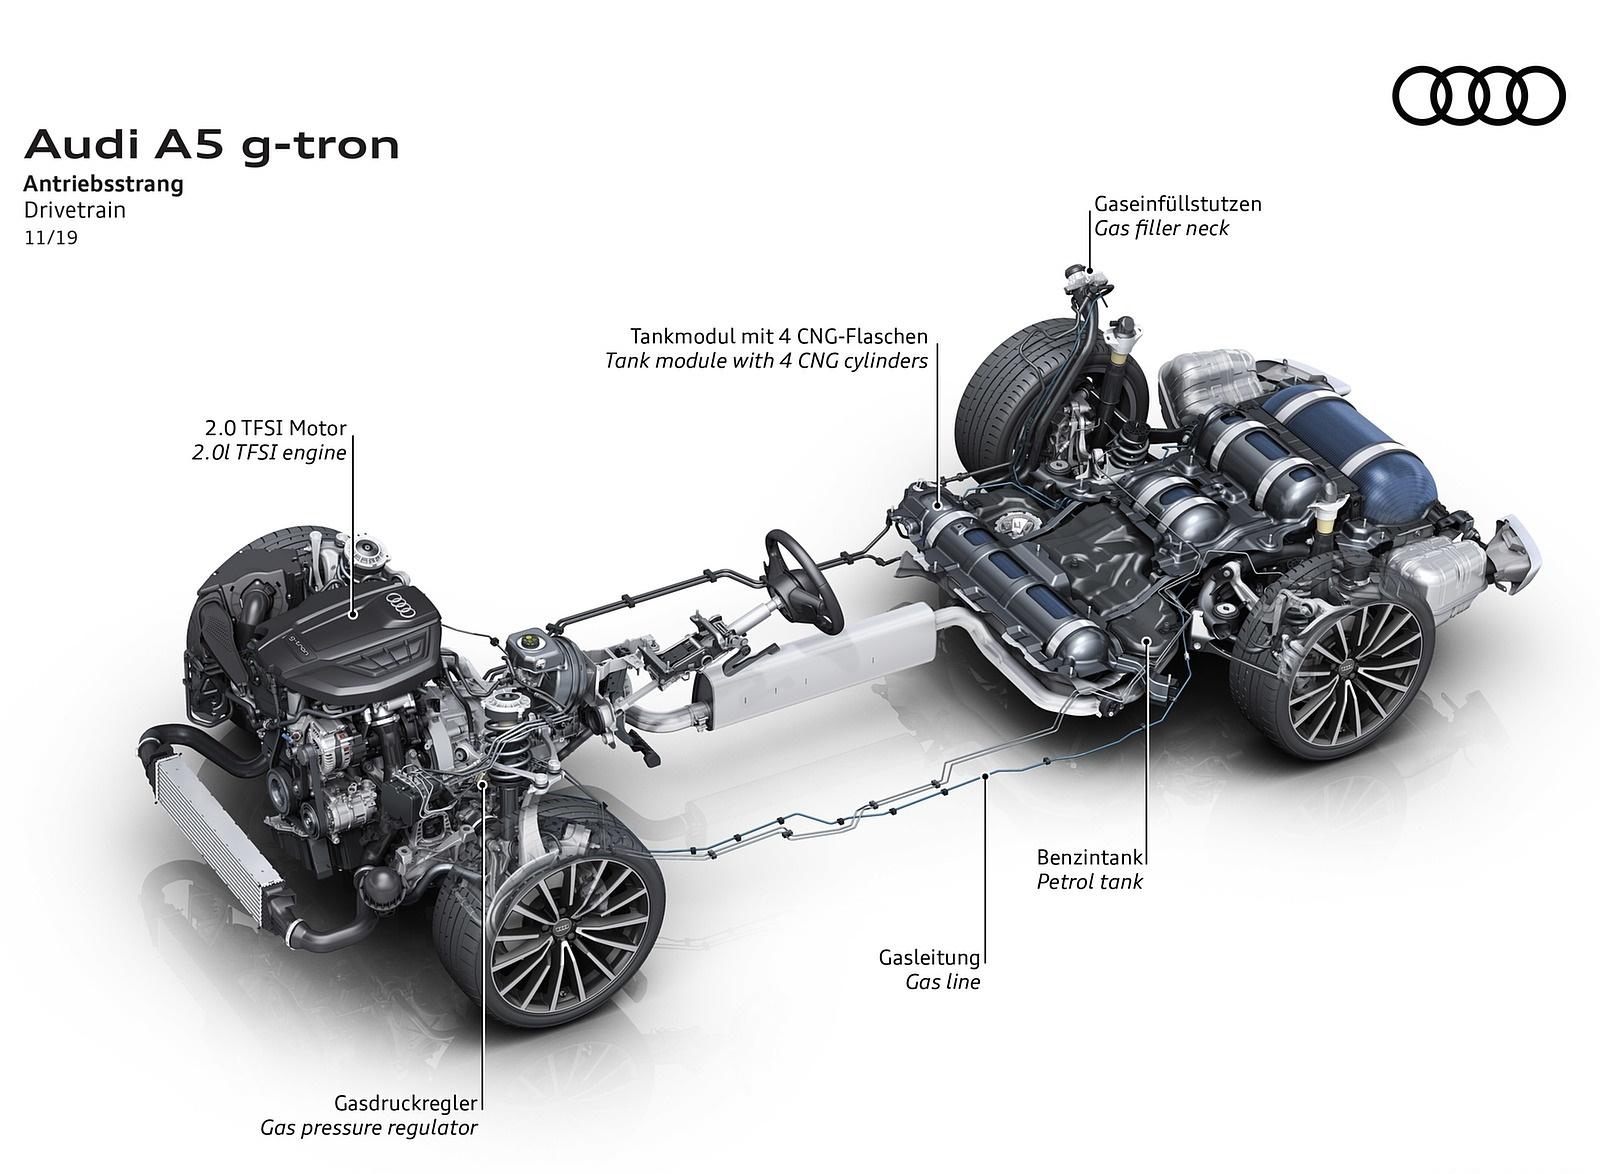 2020 Audi A5 Sportback g-tron Drivetrain Wallpapers (10)